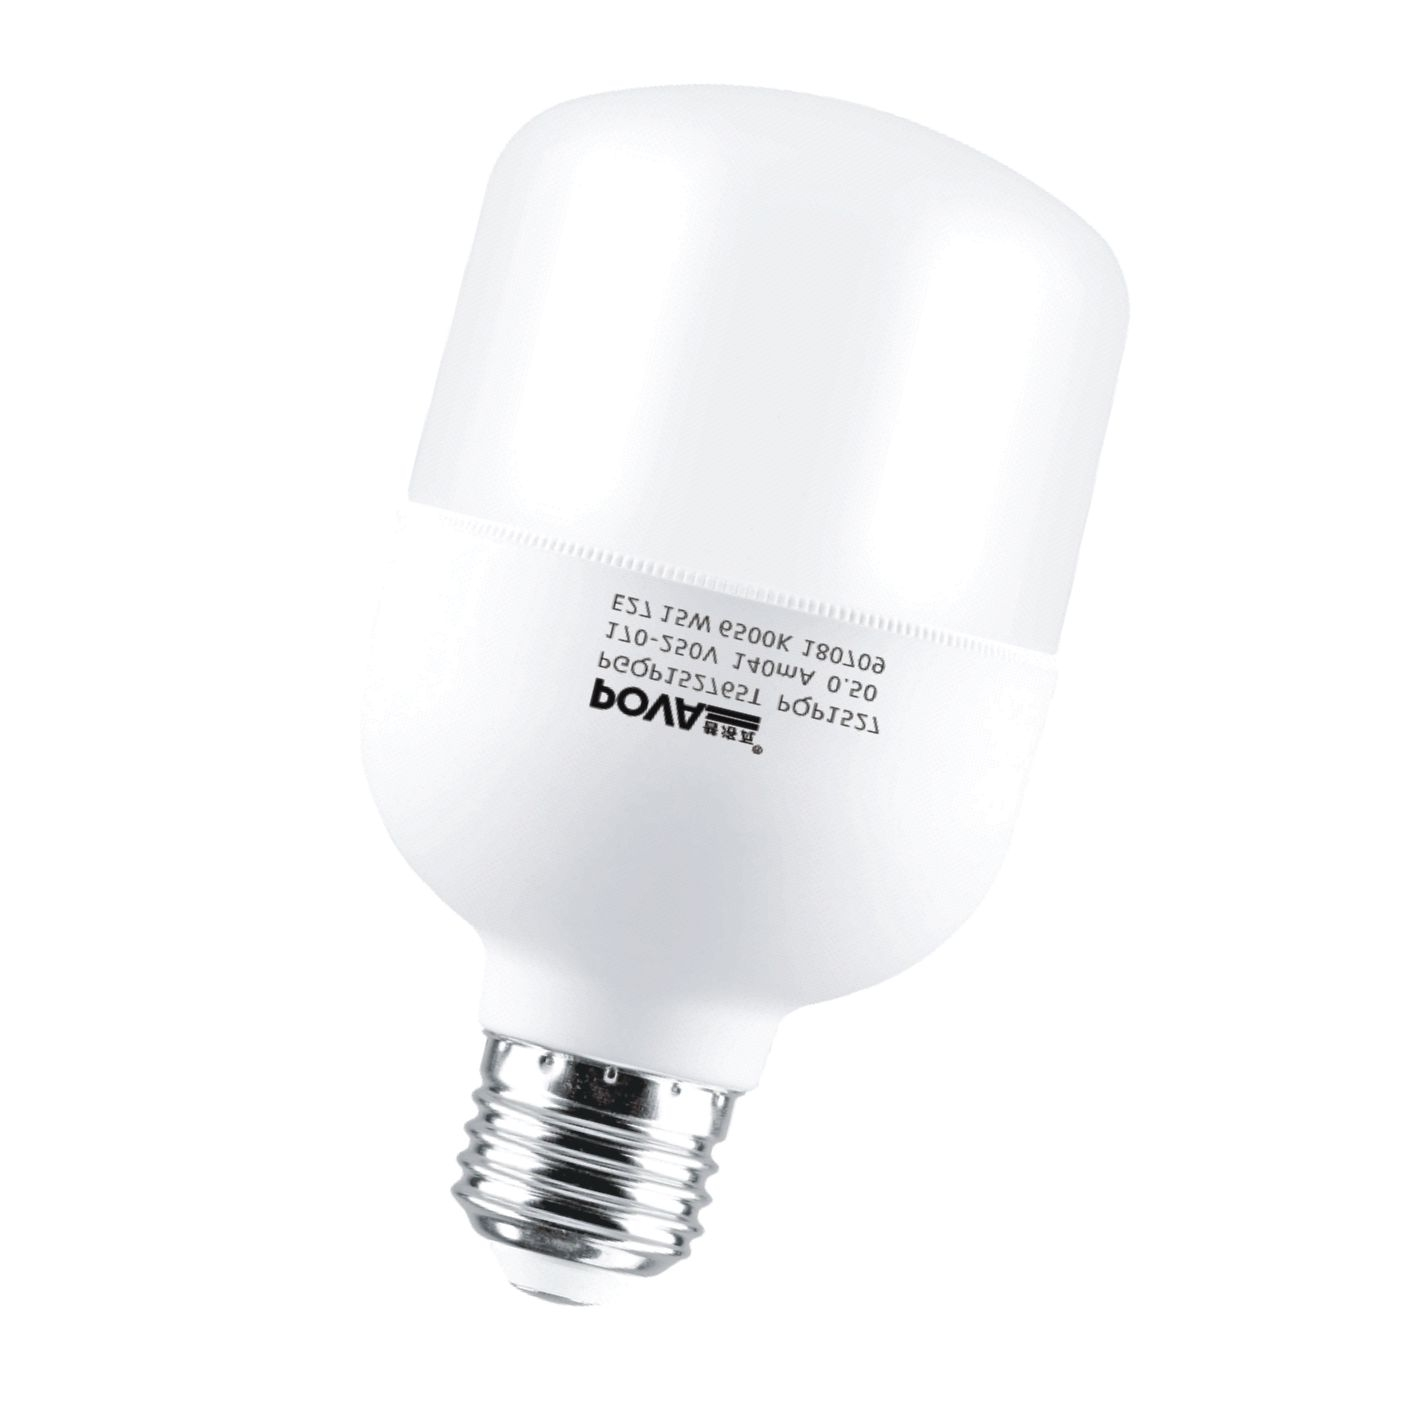 POVA普洛瓦LED球泡